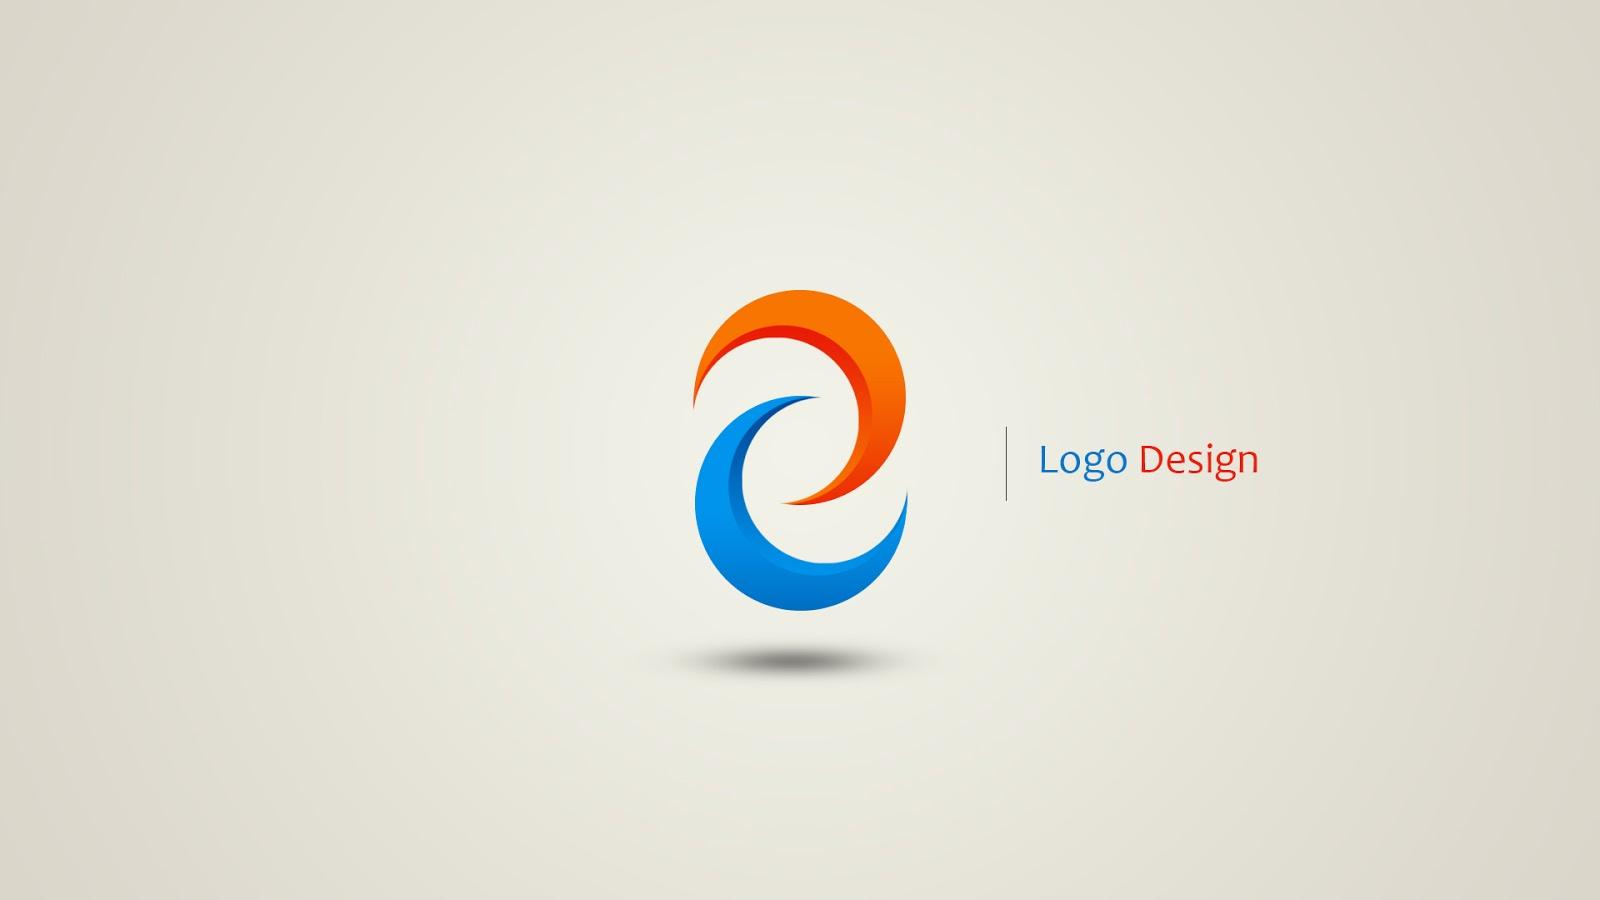 Doing Your Own Company Logo Design - Pegaweb